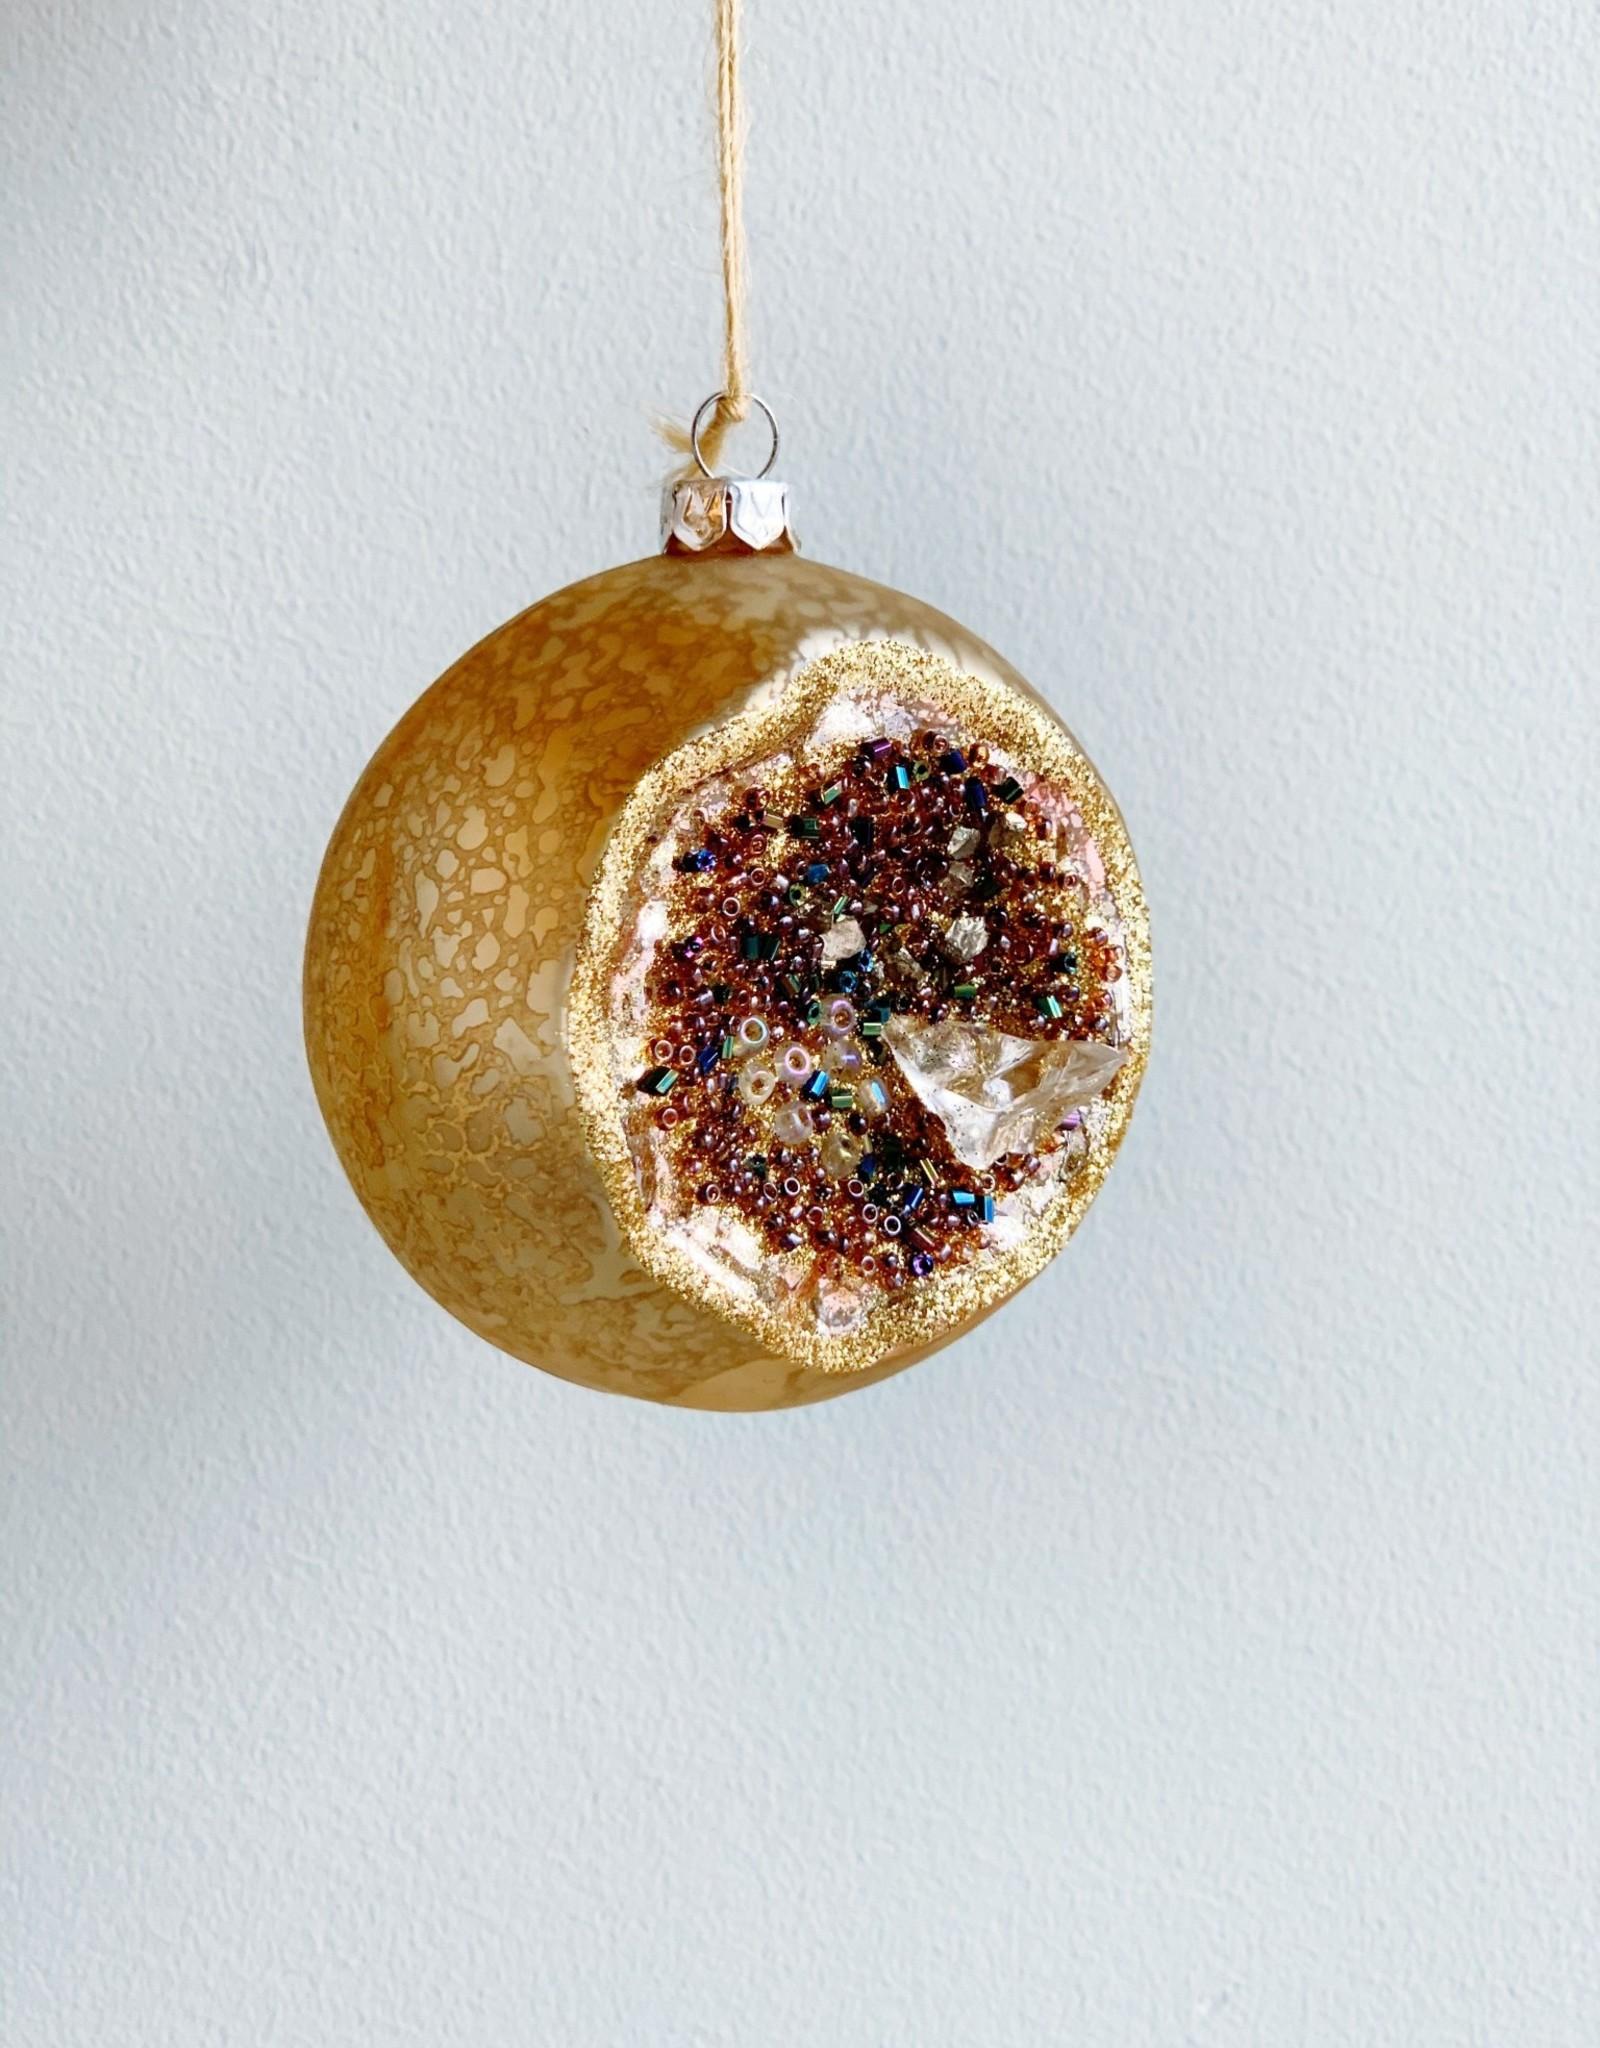 Geode Ornament